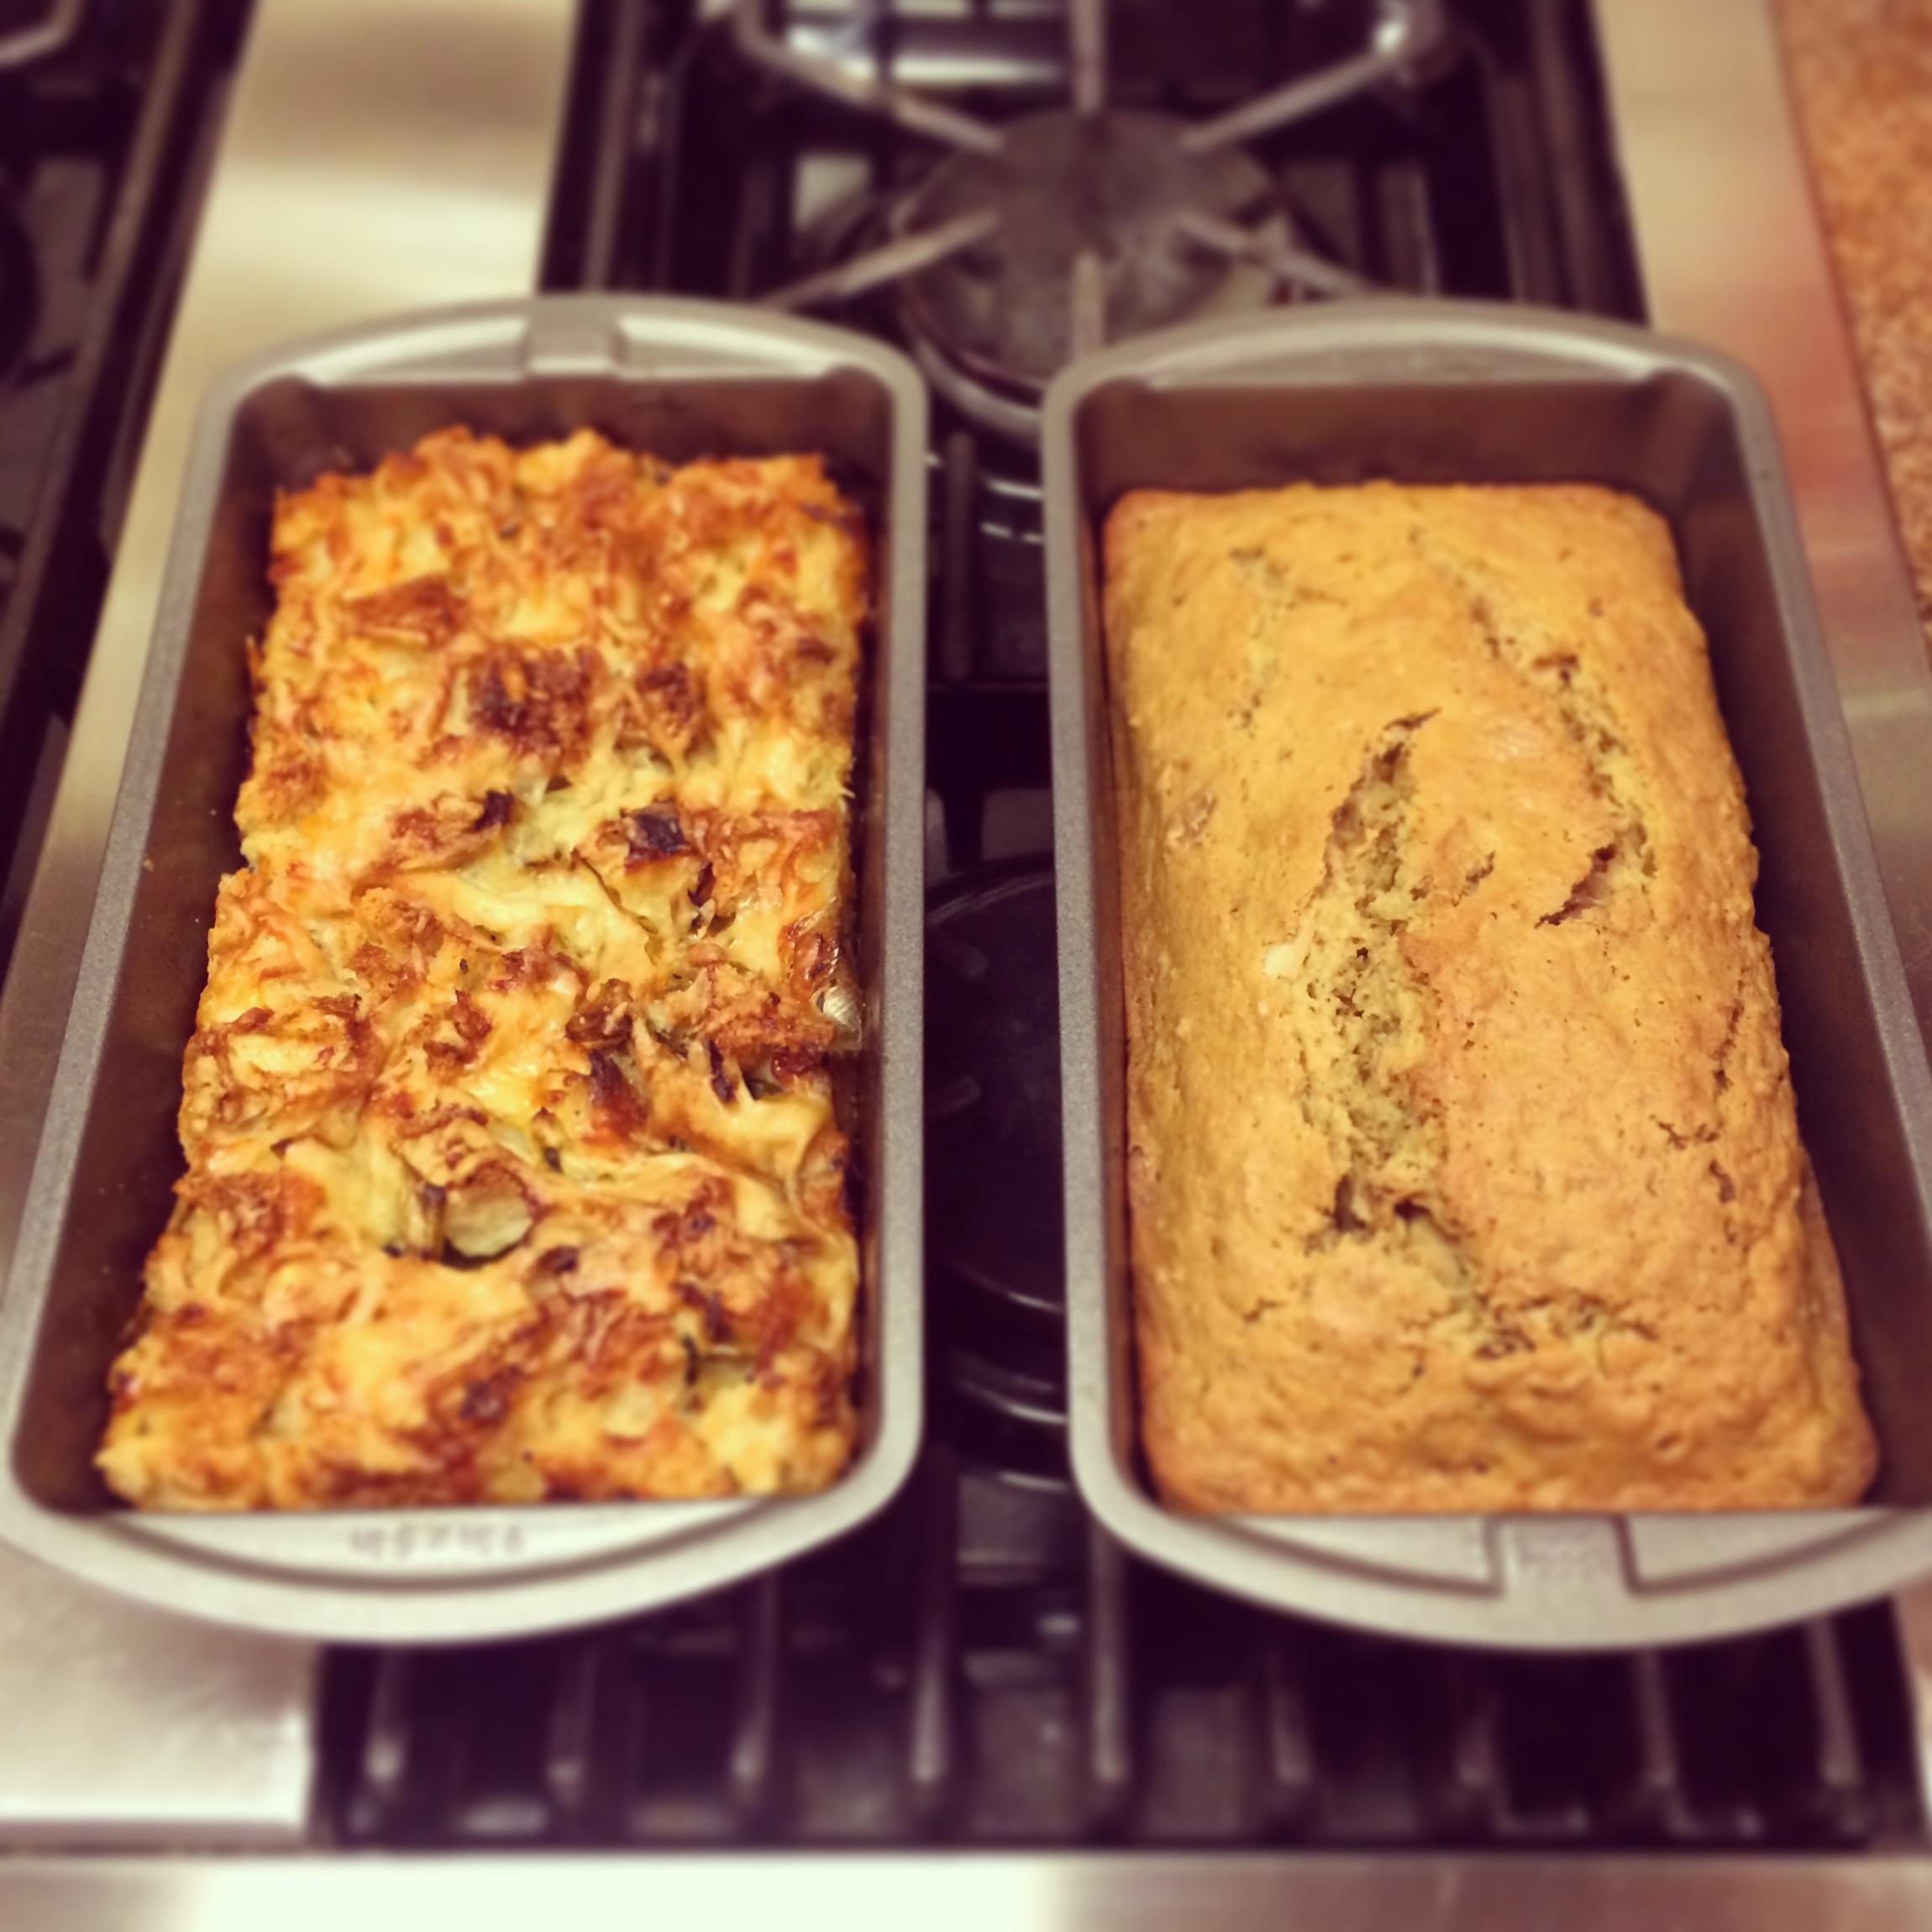 Smitten Kitchen Leek Bread Pudding | Blueberries & Basil